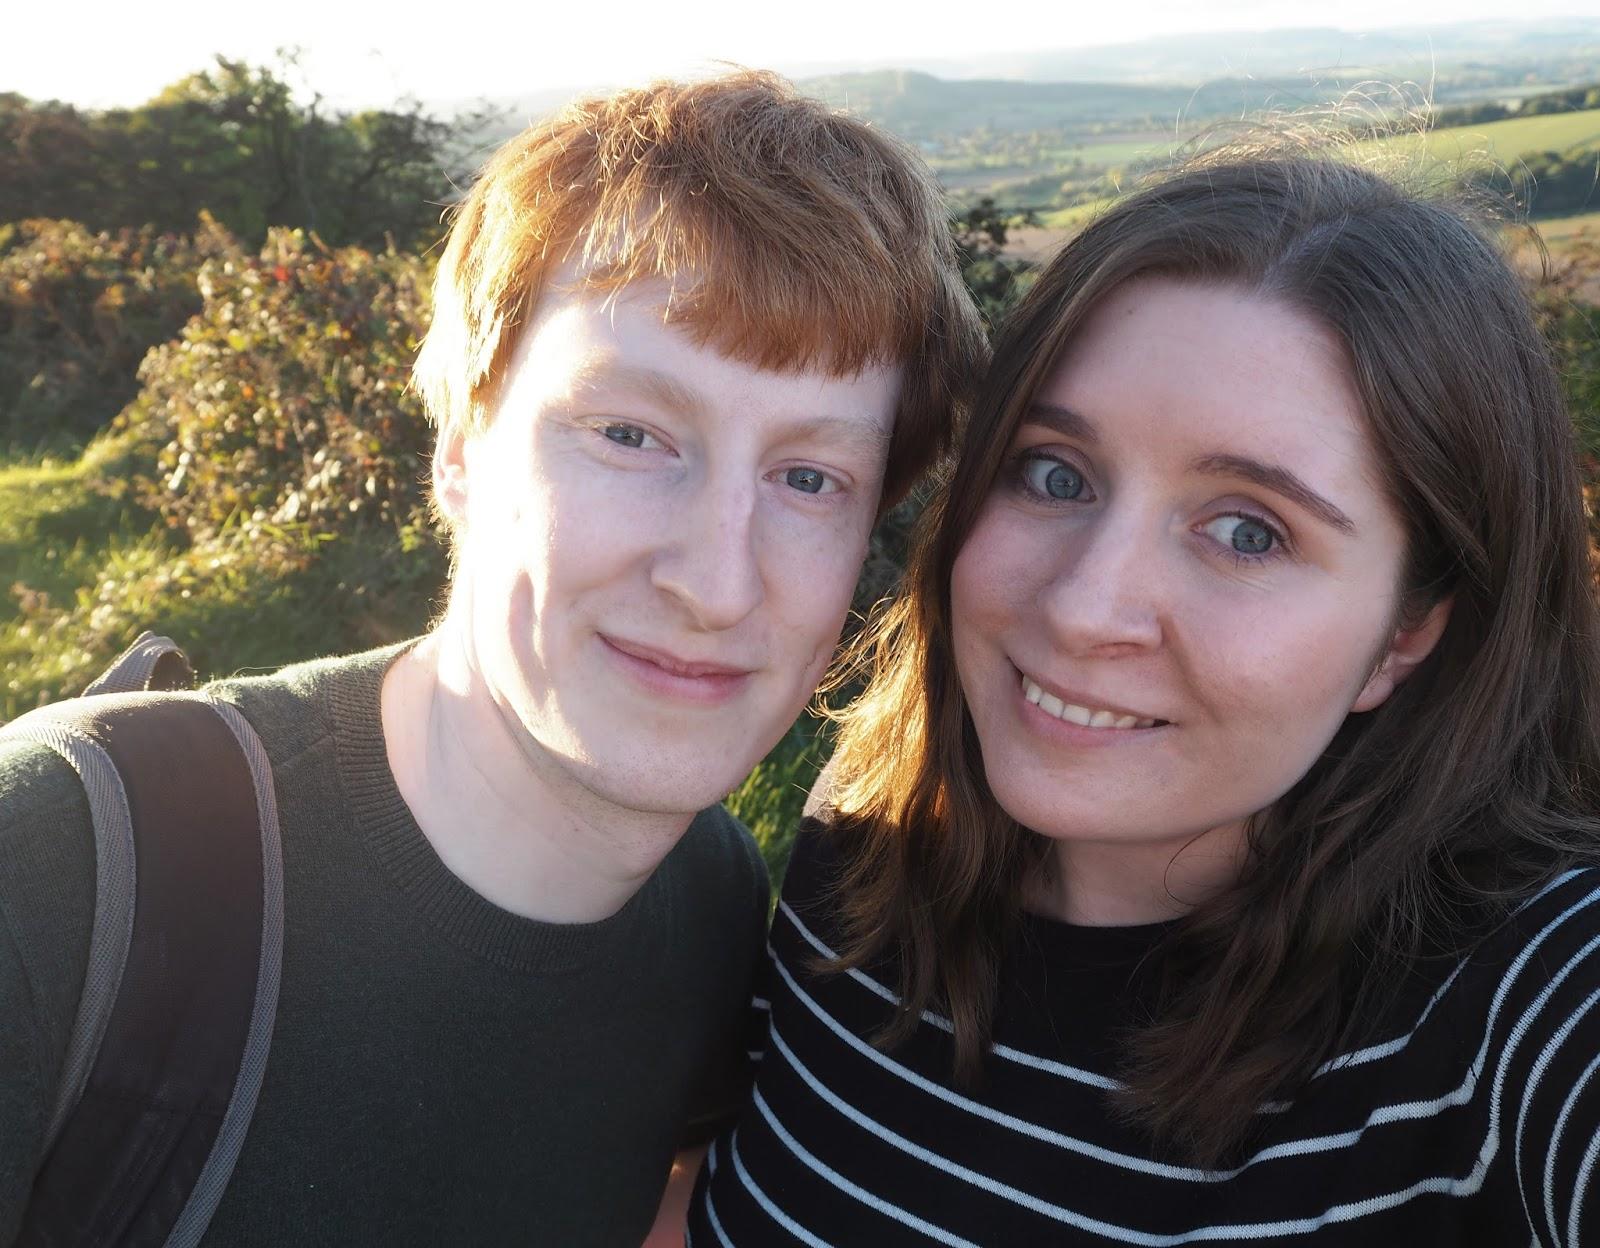 Sunset Couple Selfie